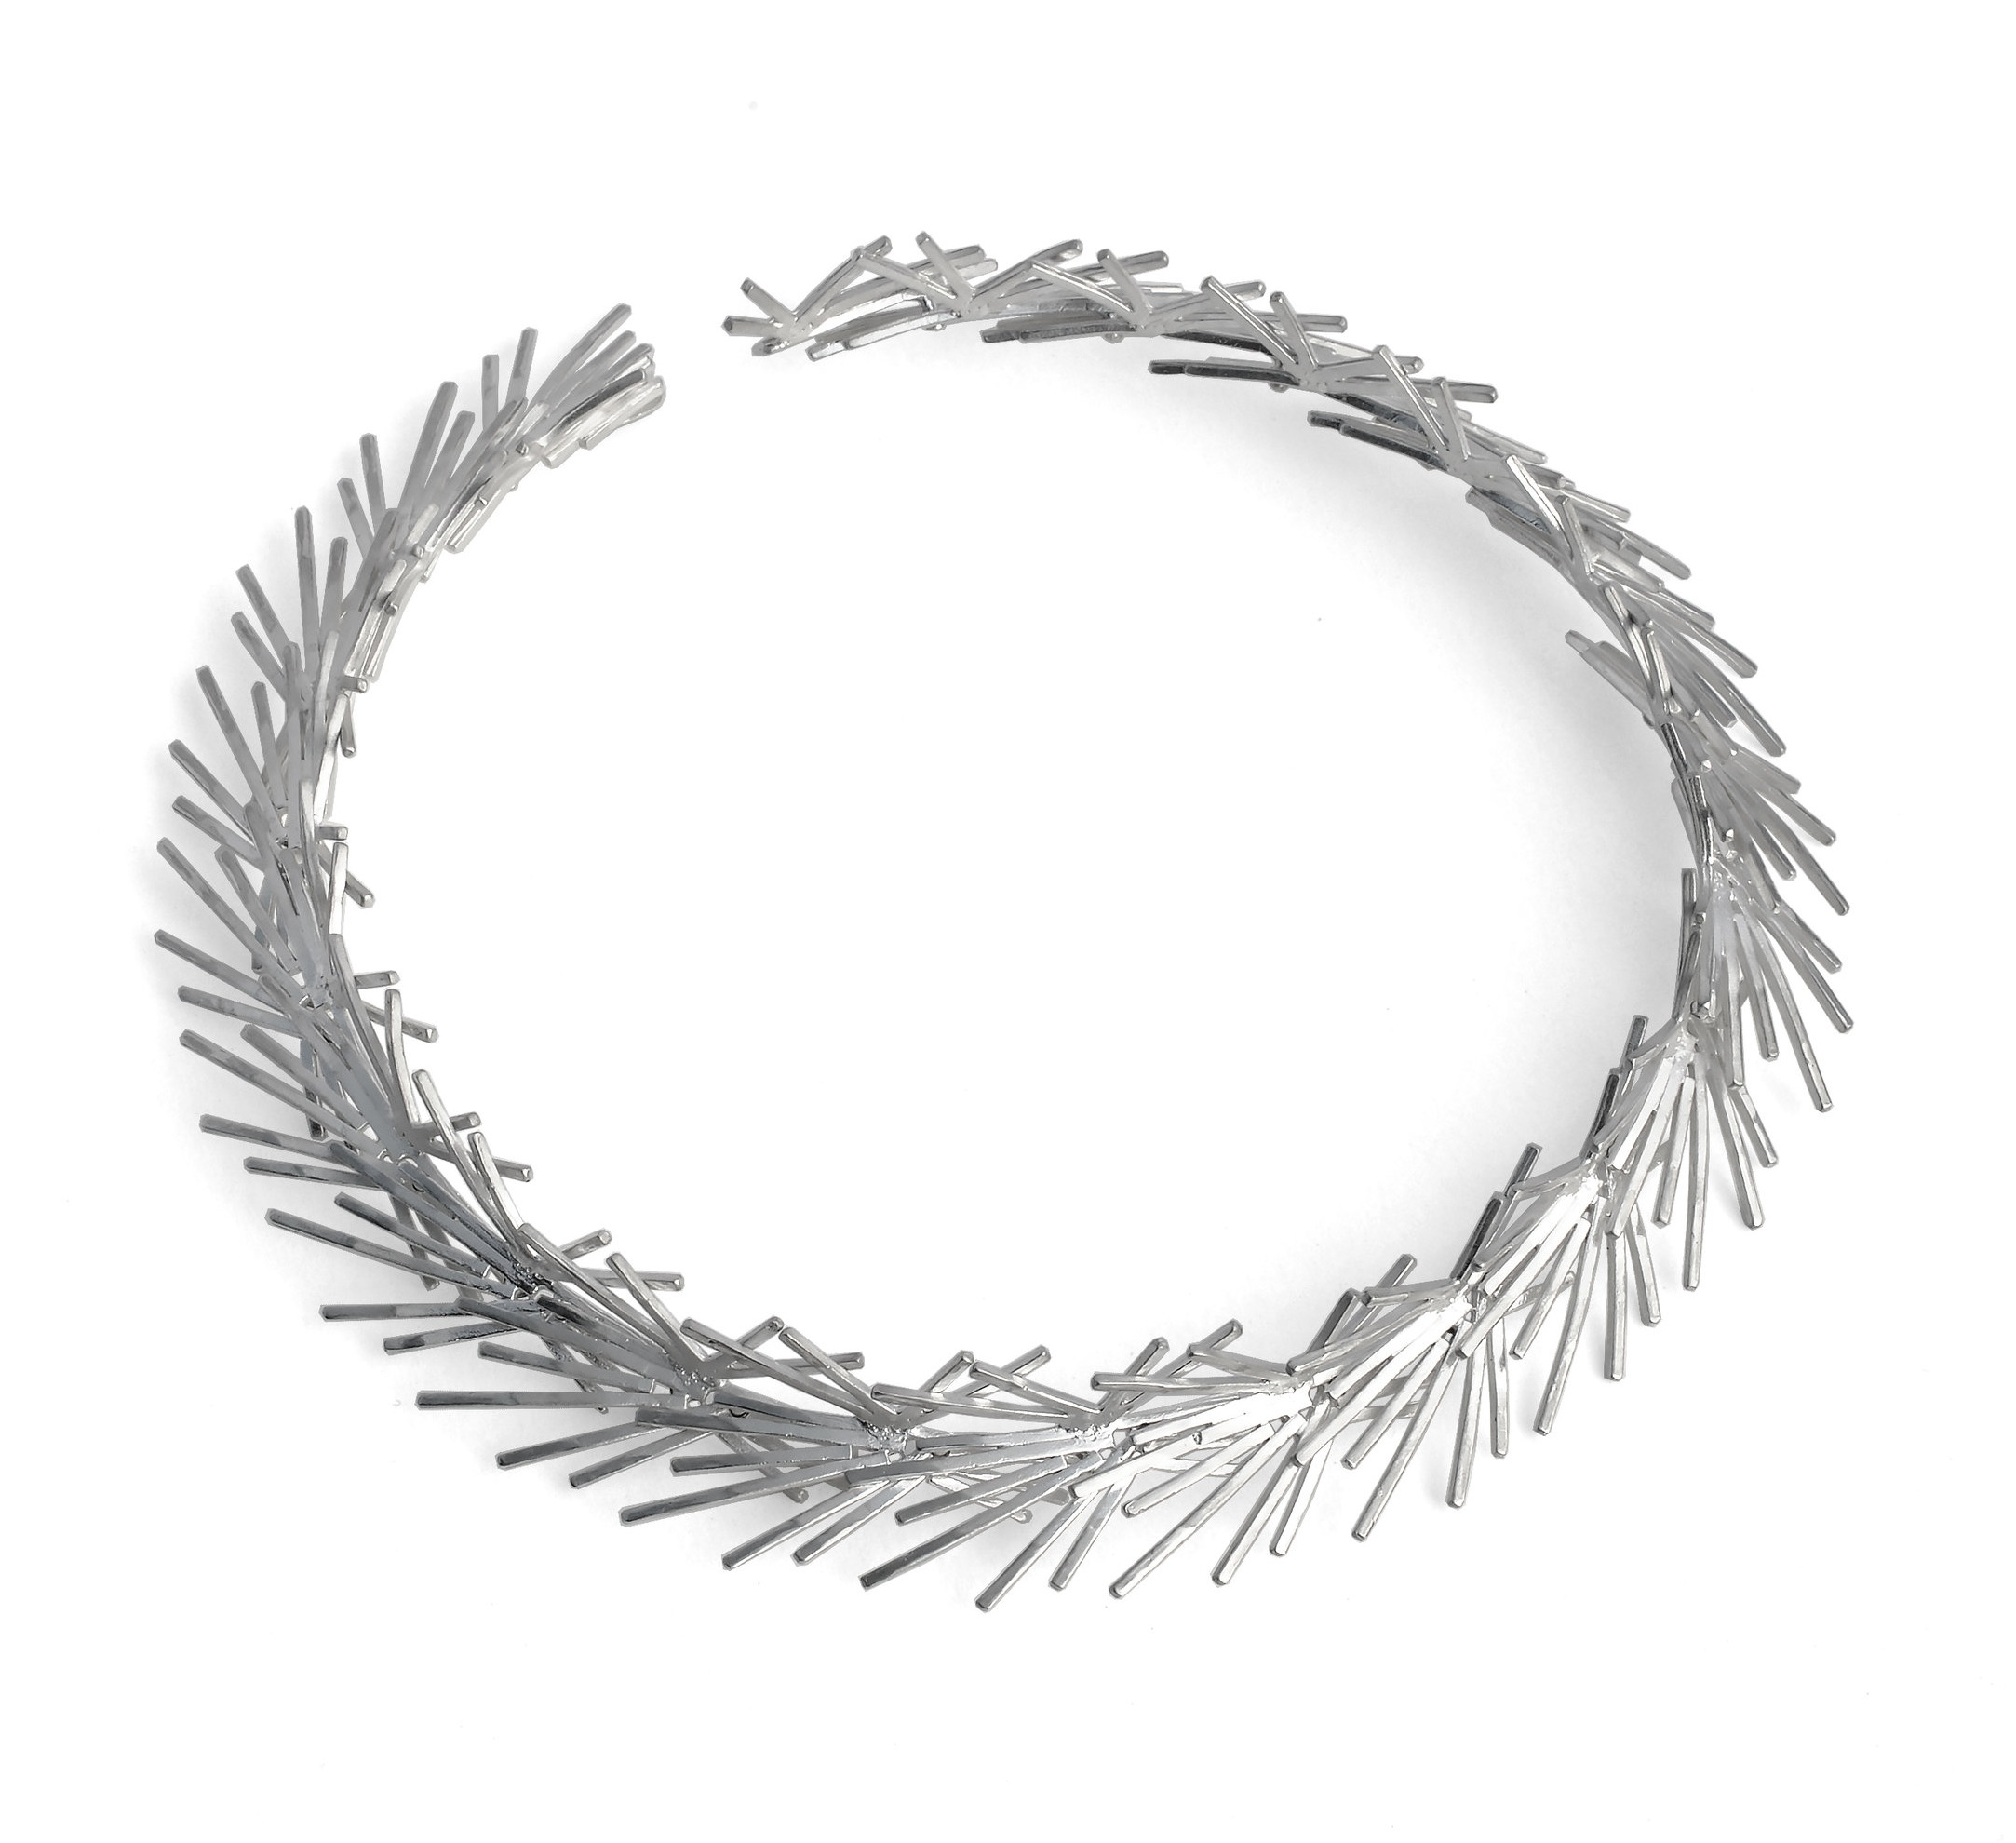 Wreath Necklace    Silver 925